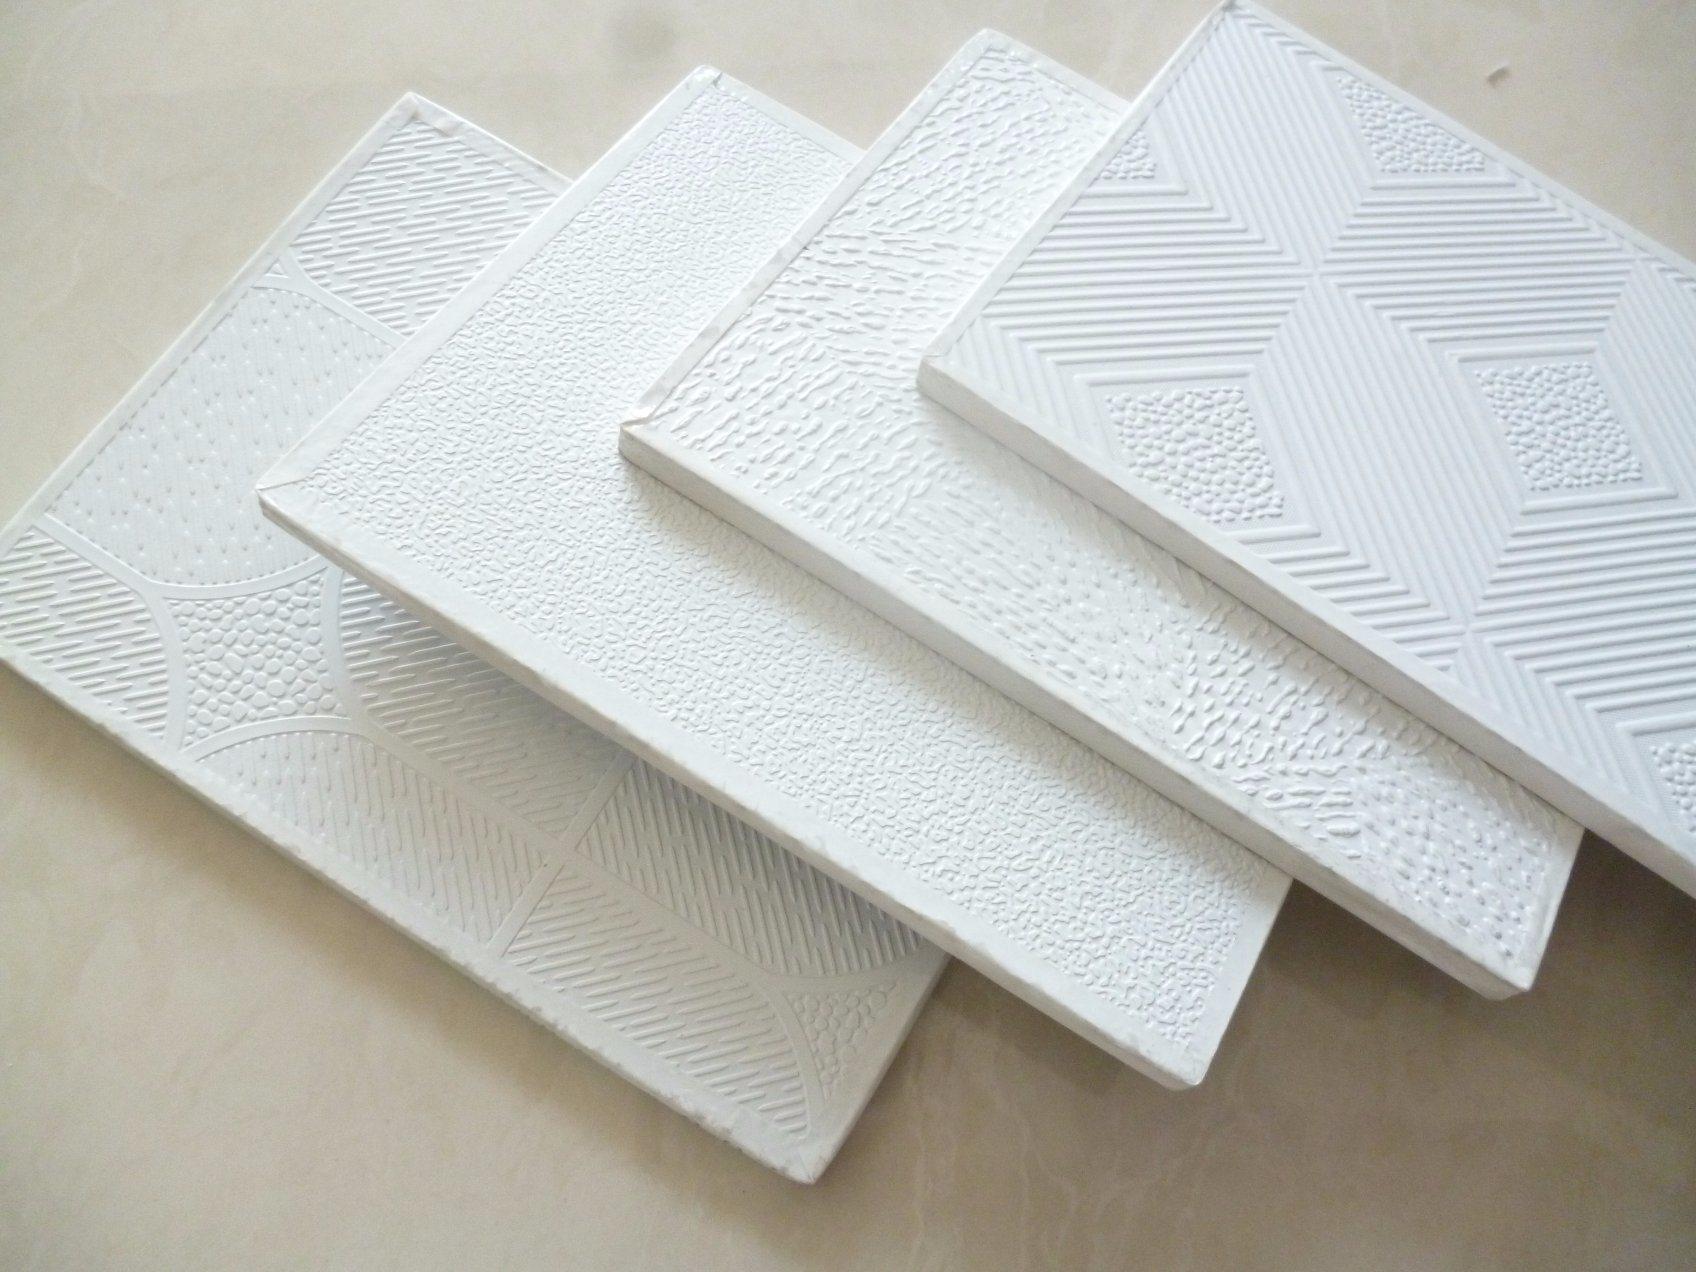 China 2 2 pvc laminated gypsum ceiling tiles design 998 photos 2 2 pvc laminated gypsum ceiling tiles design 998 dailygadgetfo Gallery